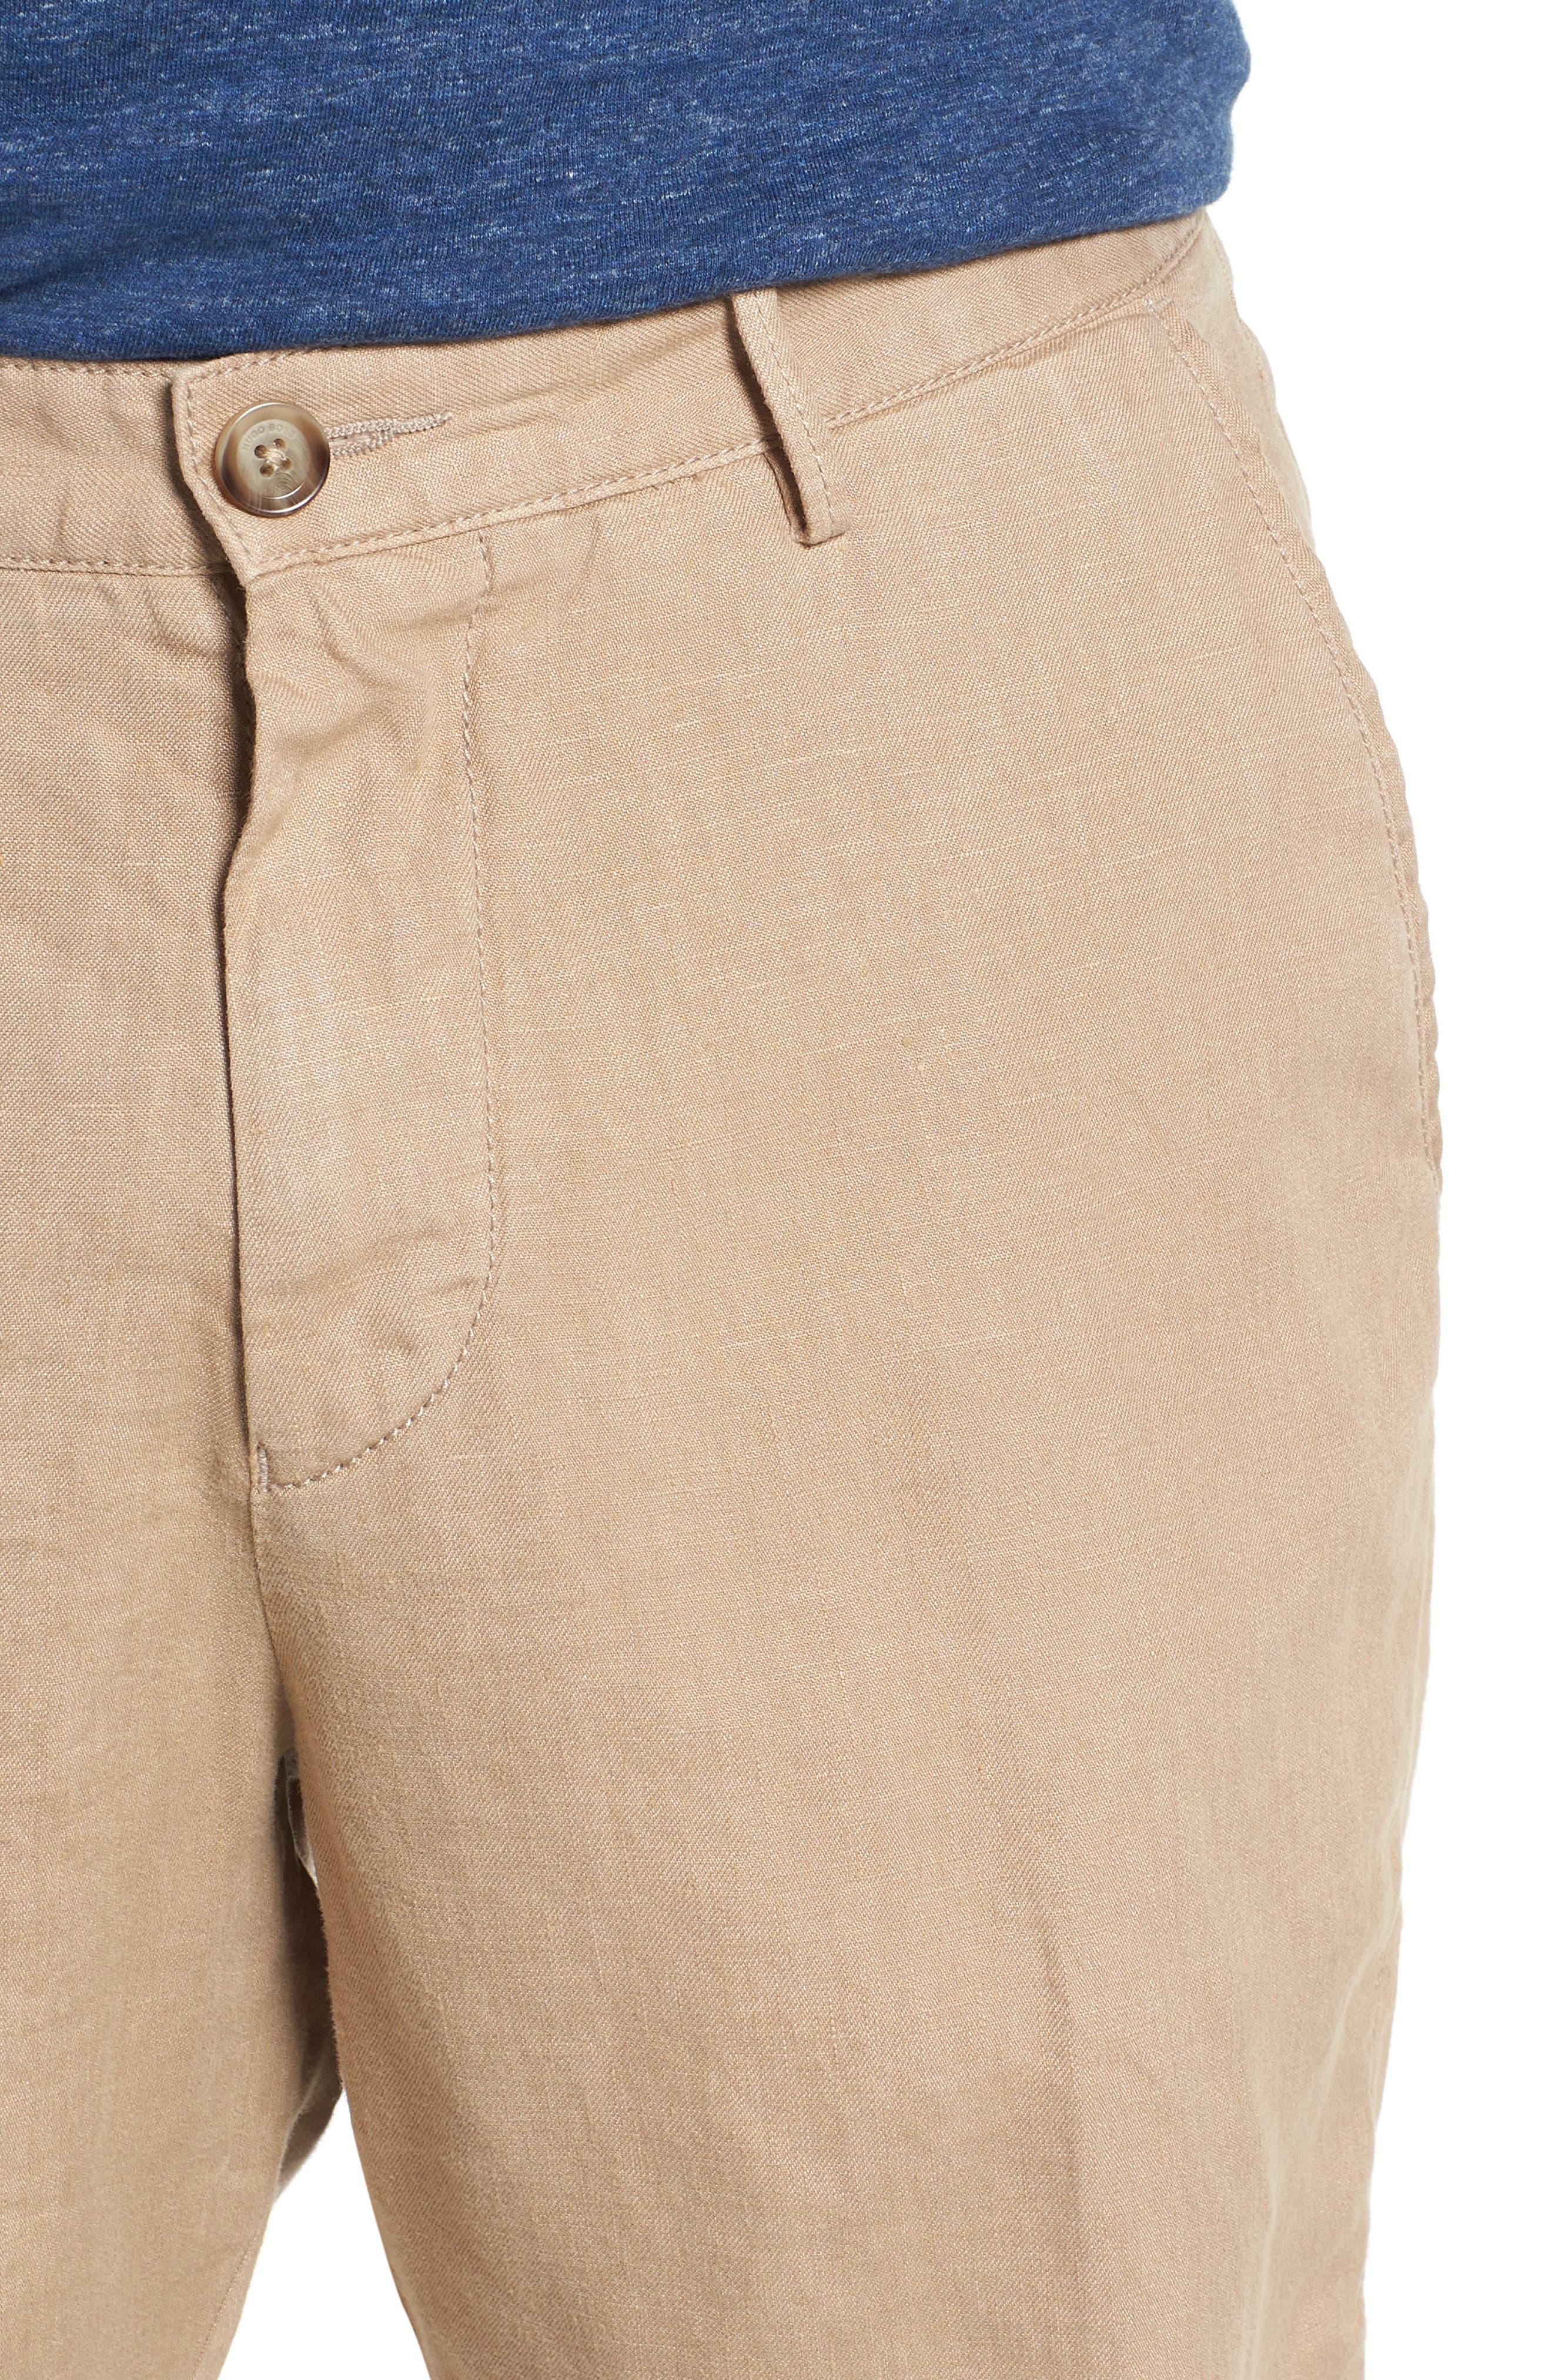 Crigan Linen Shorts,                             Alternate thumbnail 19, color,